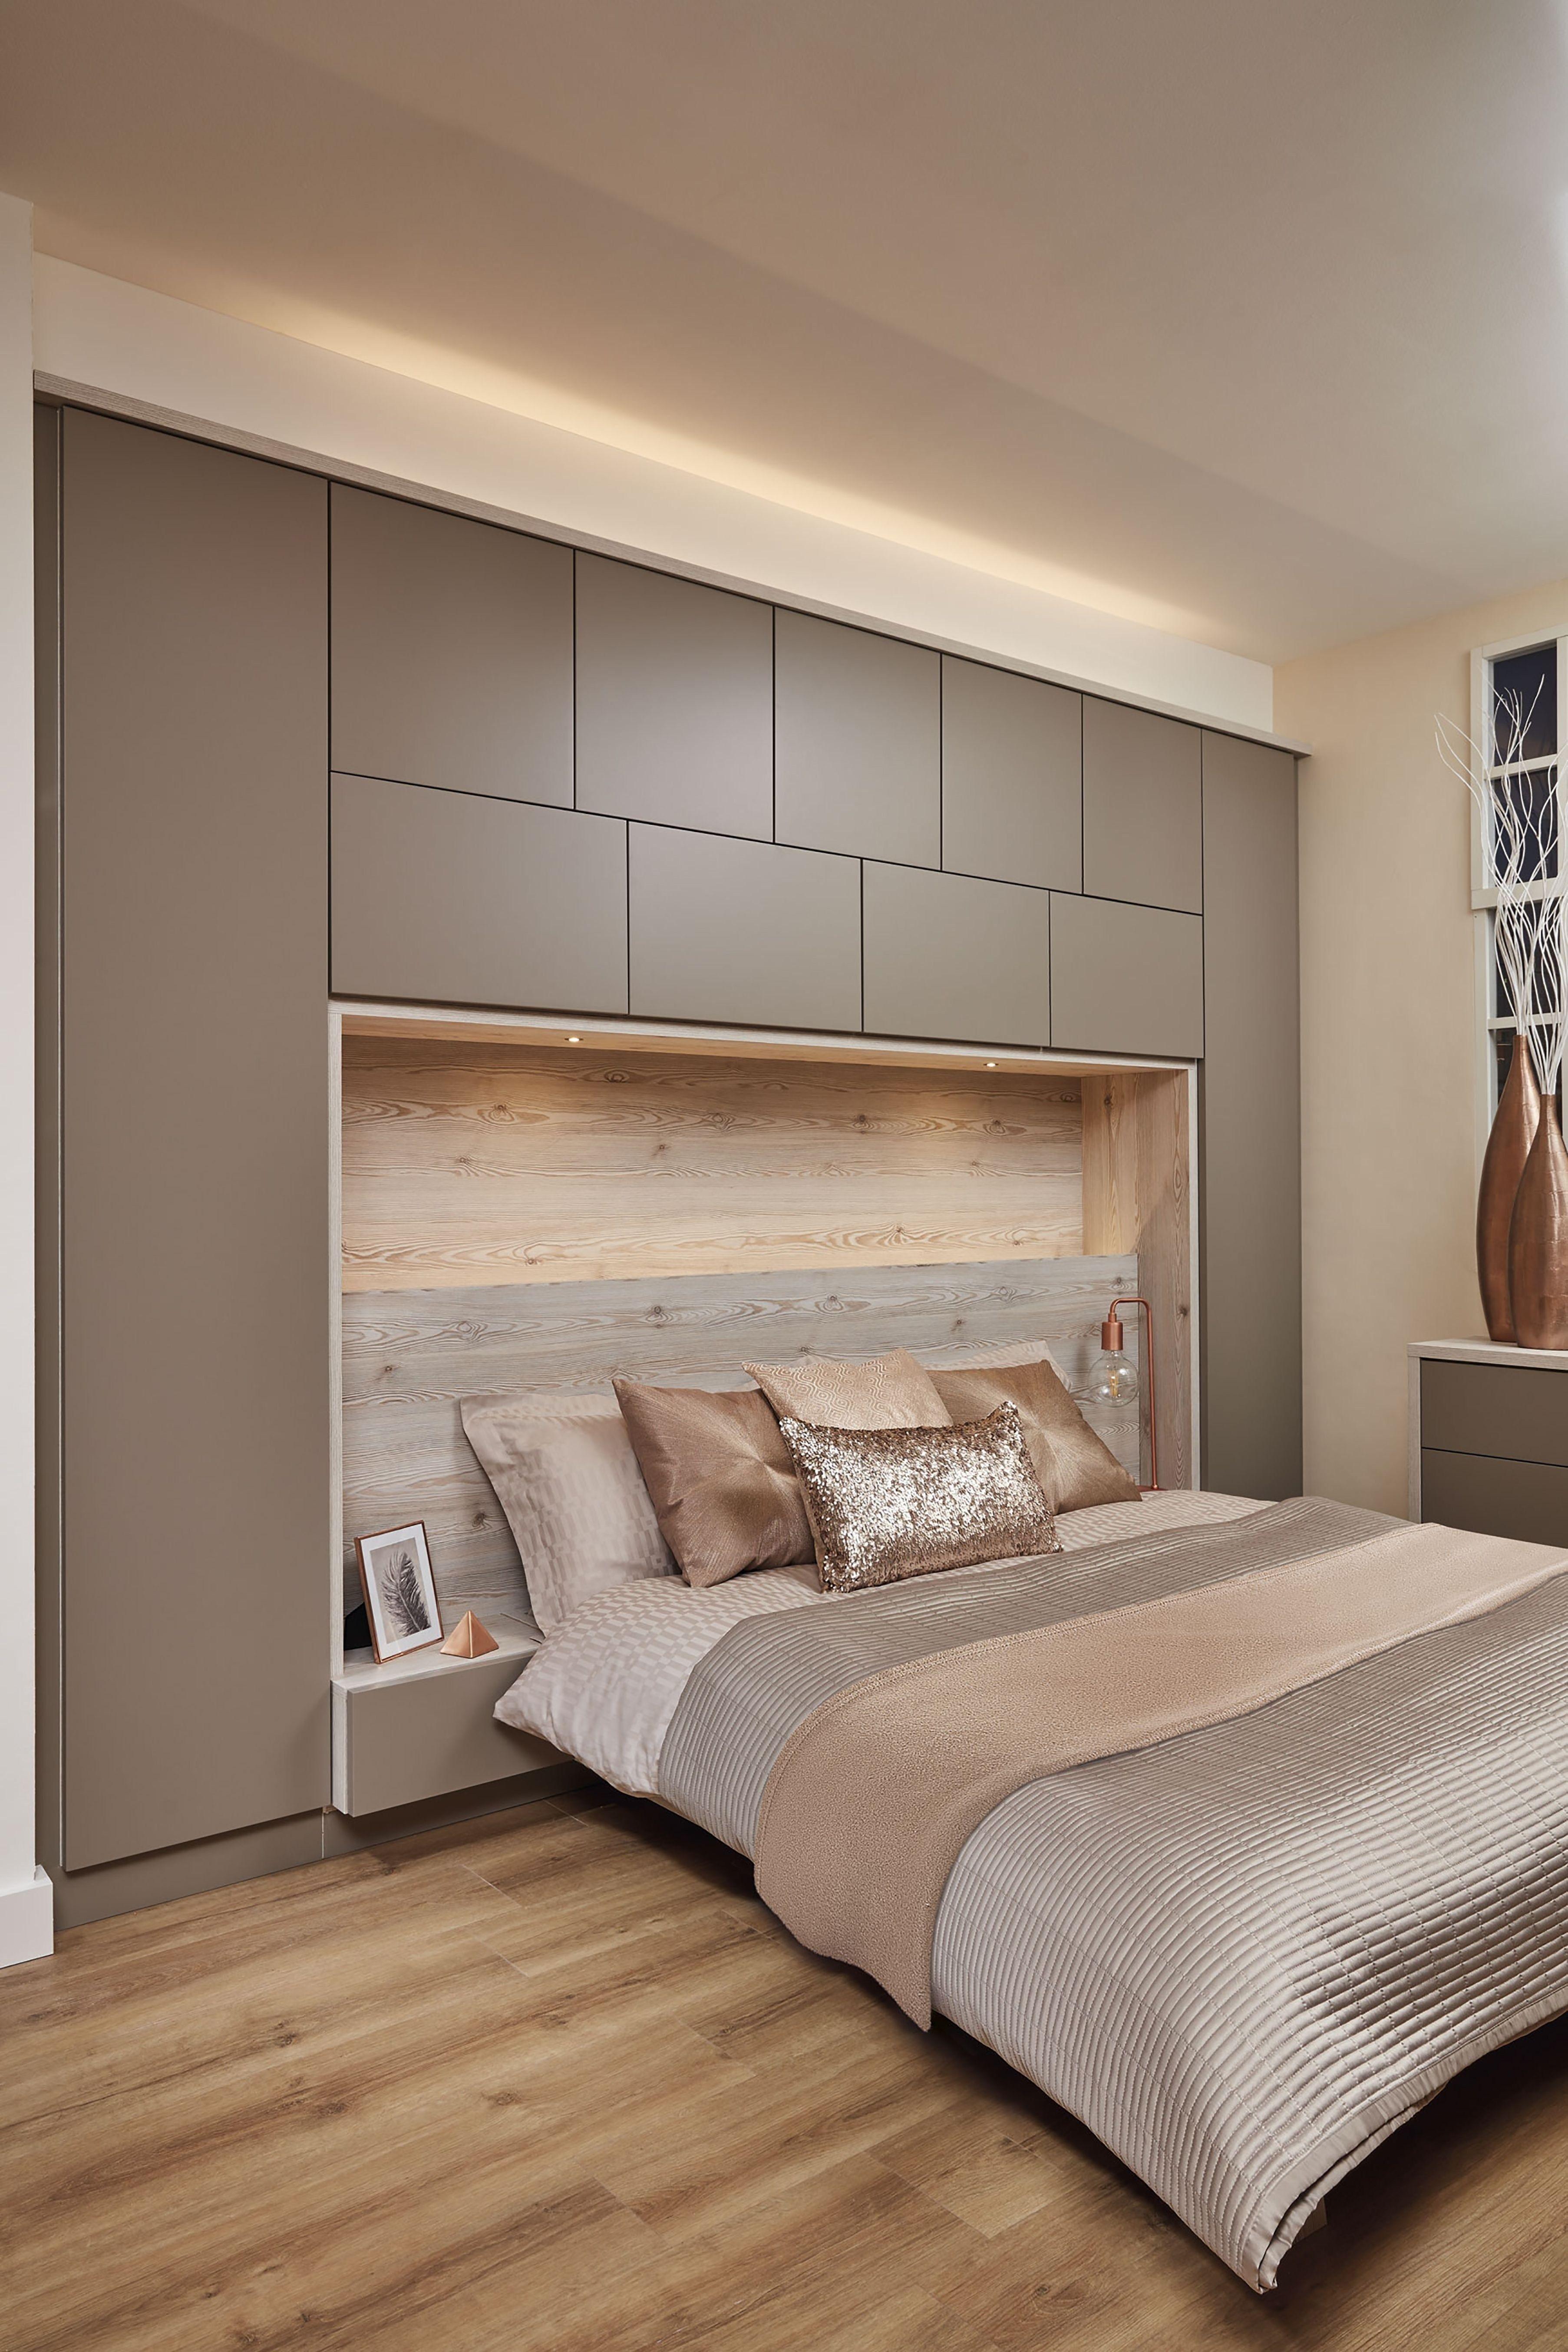 28 Interesting Rustic Storage Bed Design Ideas Bedroom ...